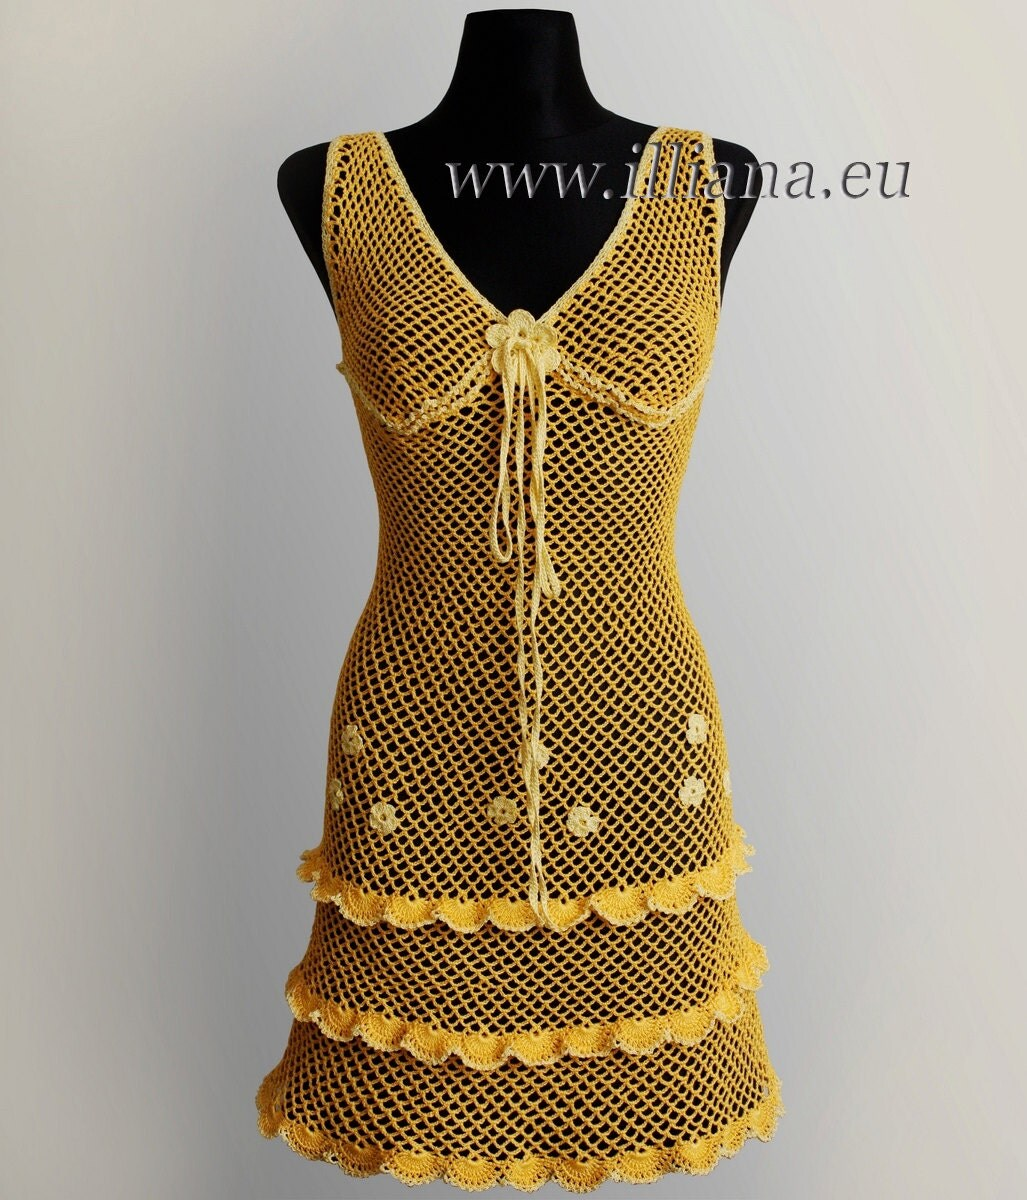 Crochet Xxl Patterns : Crochet Pattern . Dress No 232. Sizes S to XXL